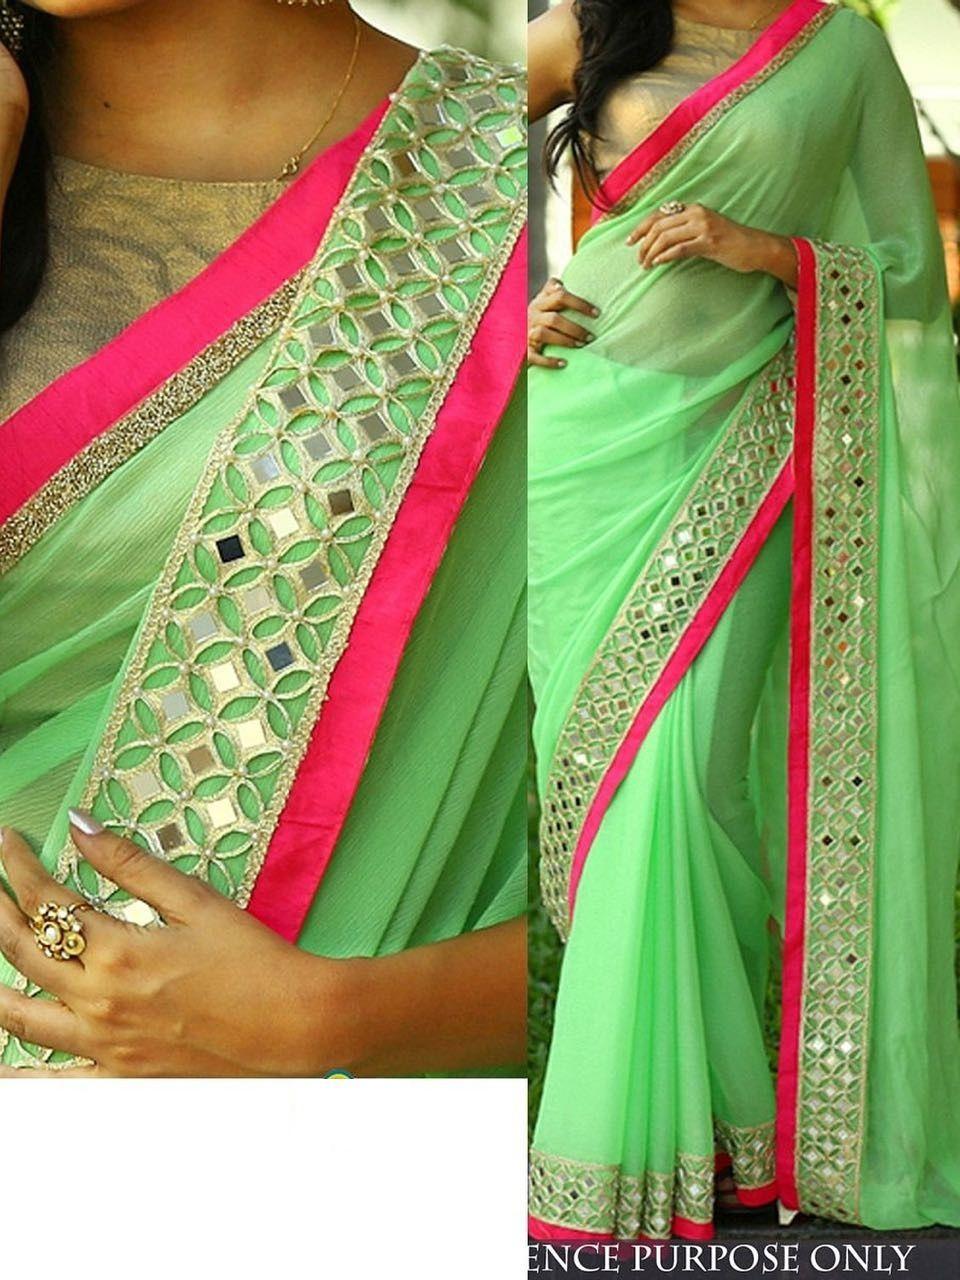 dbea609981 Shop Pista green color Nylon georgette designer party wear saree online at…